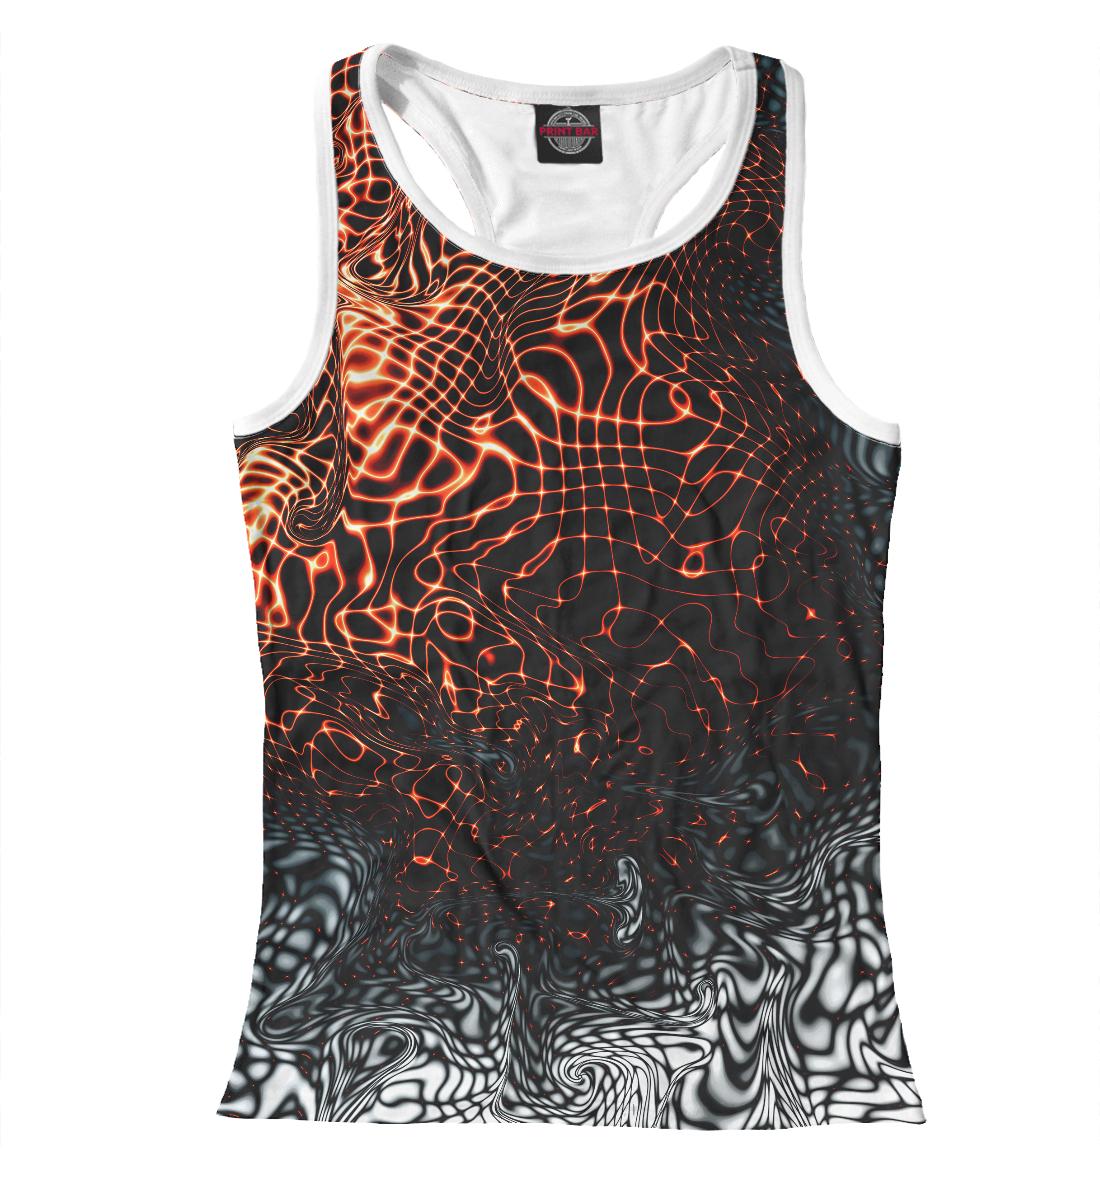 Купить Molted lava, Printbar, Майки борцовки, APD-985735-mayb-1